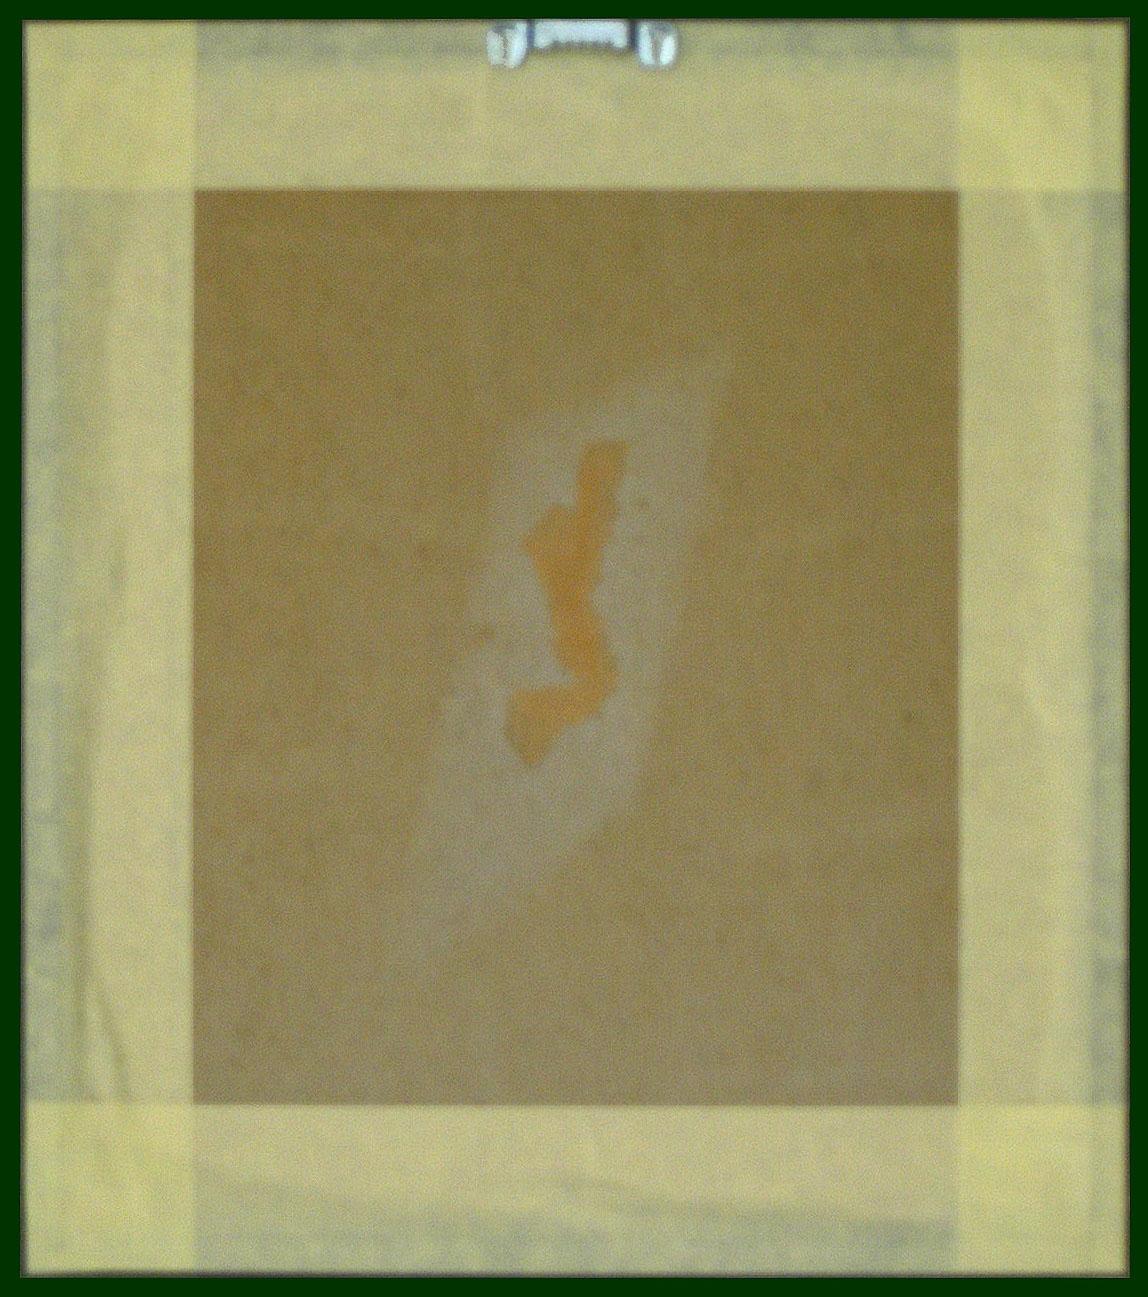 095-005hat.JPG (1148×1297)